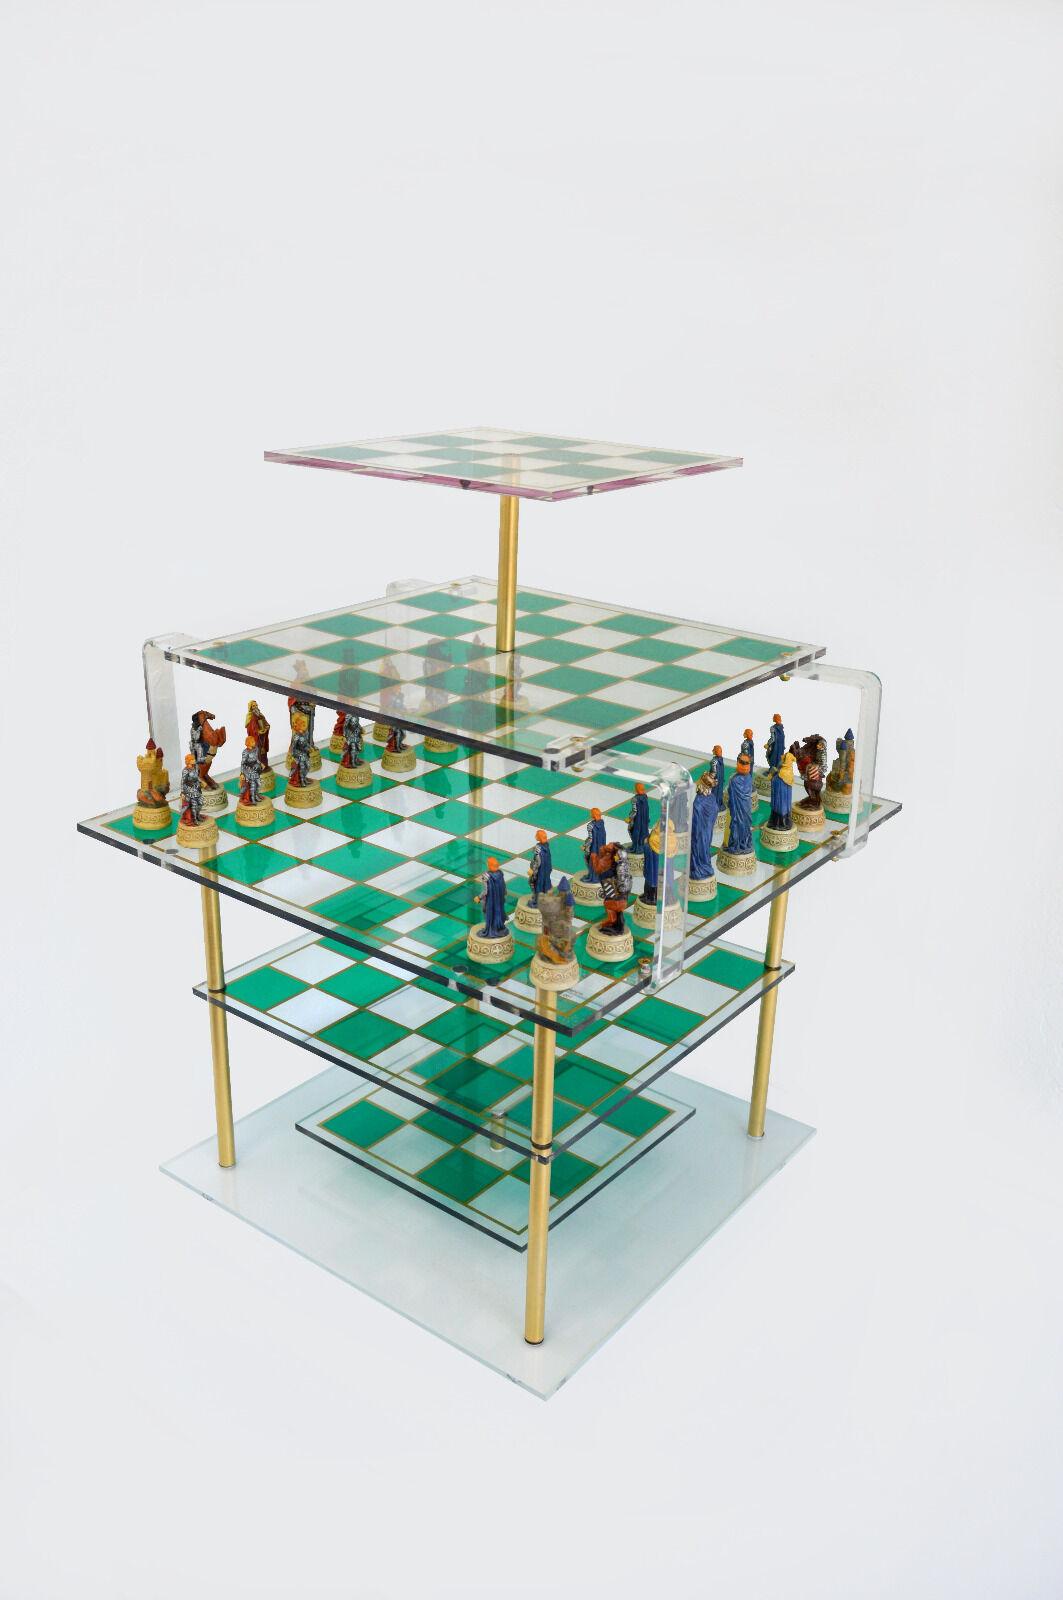 3D Three Dimensional Chess Full Dimensione